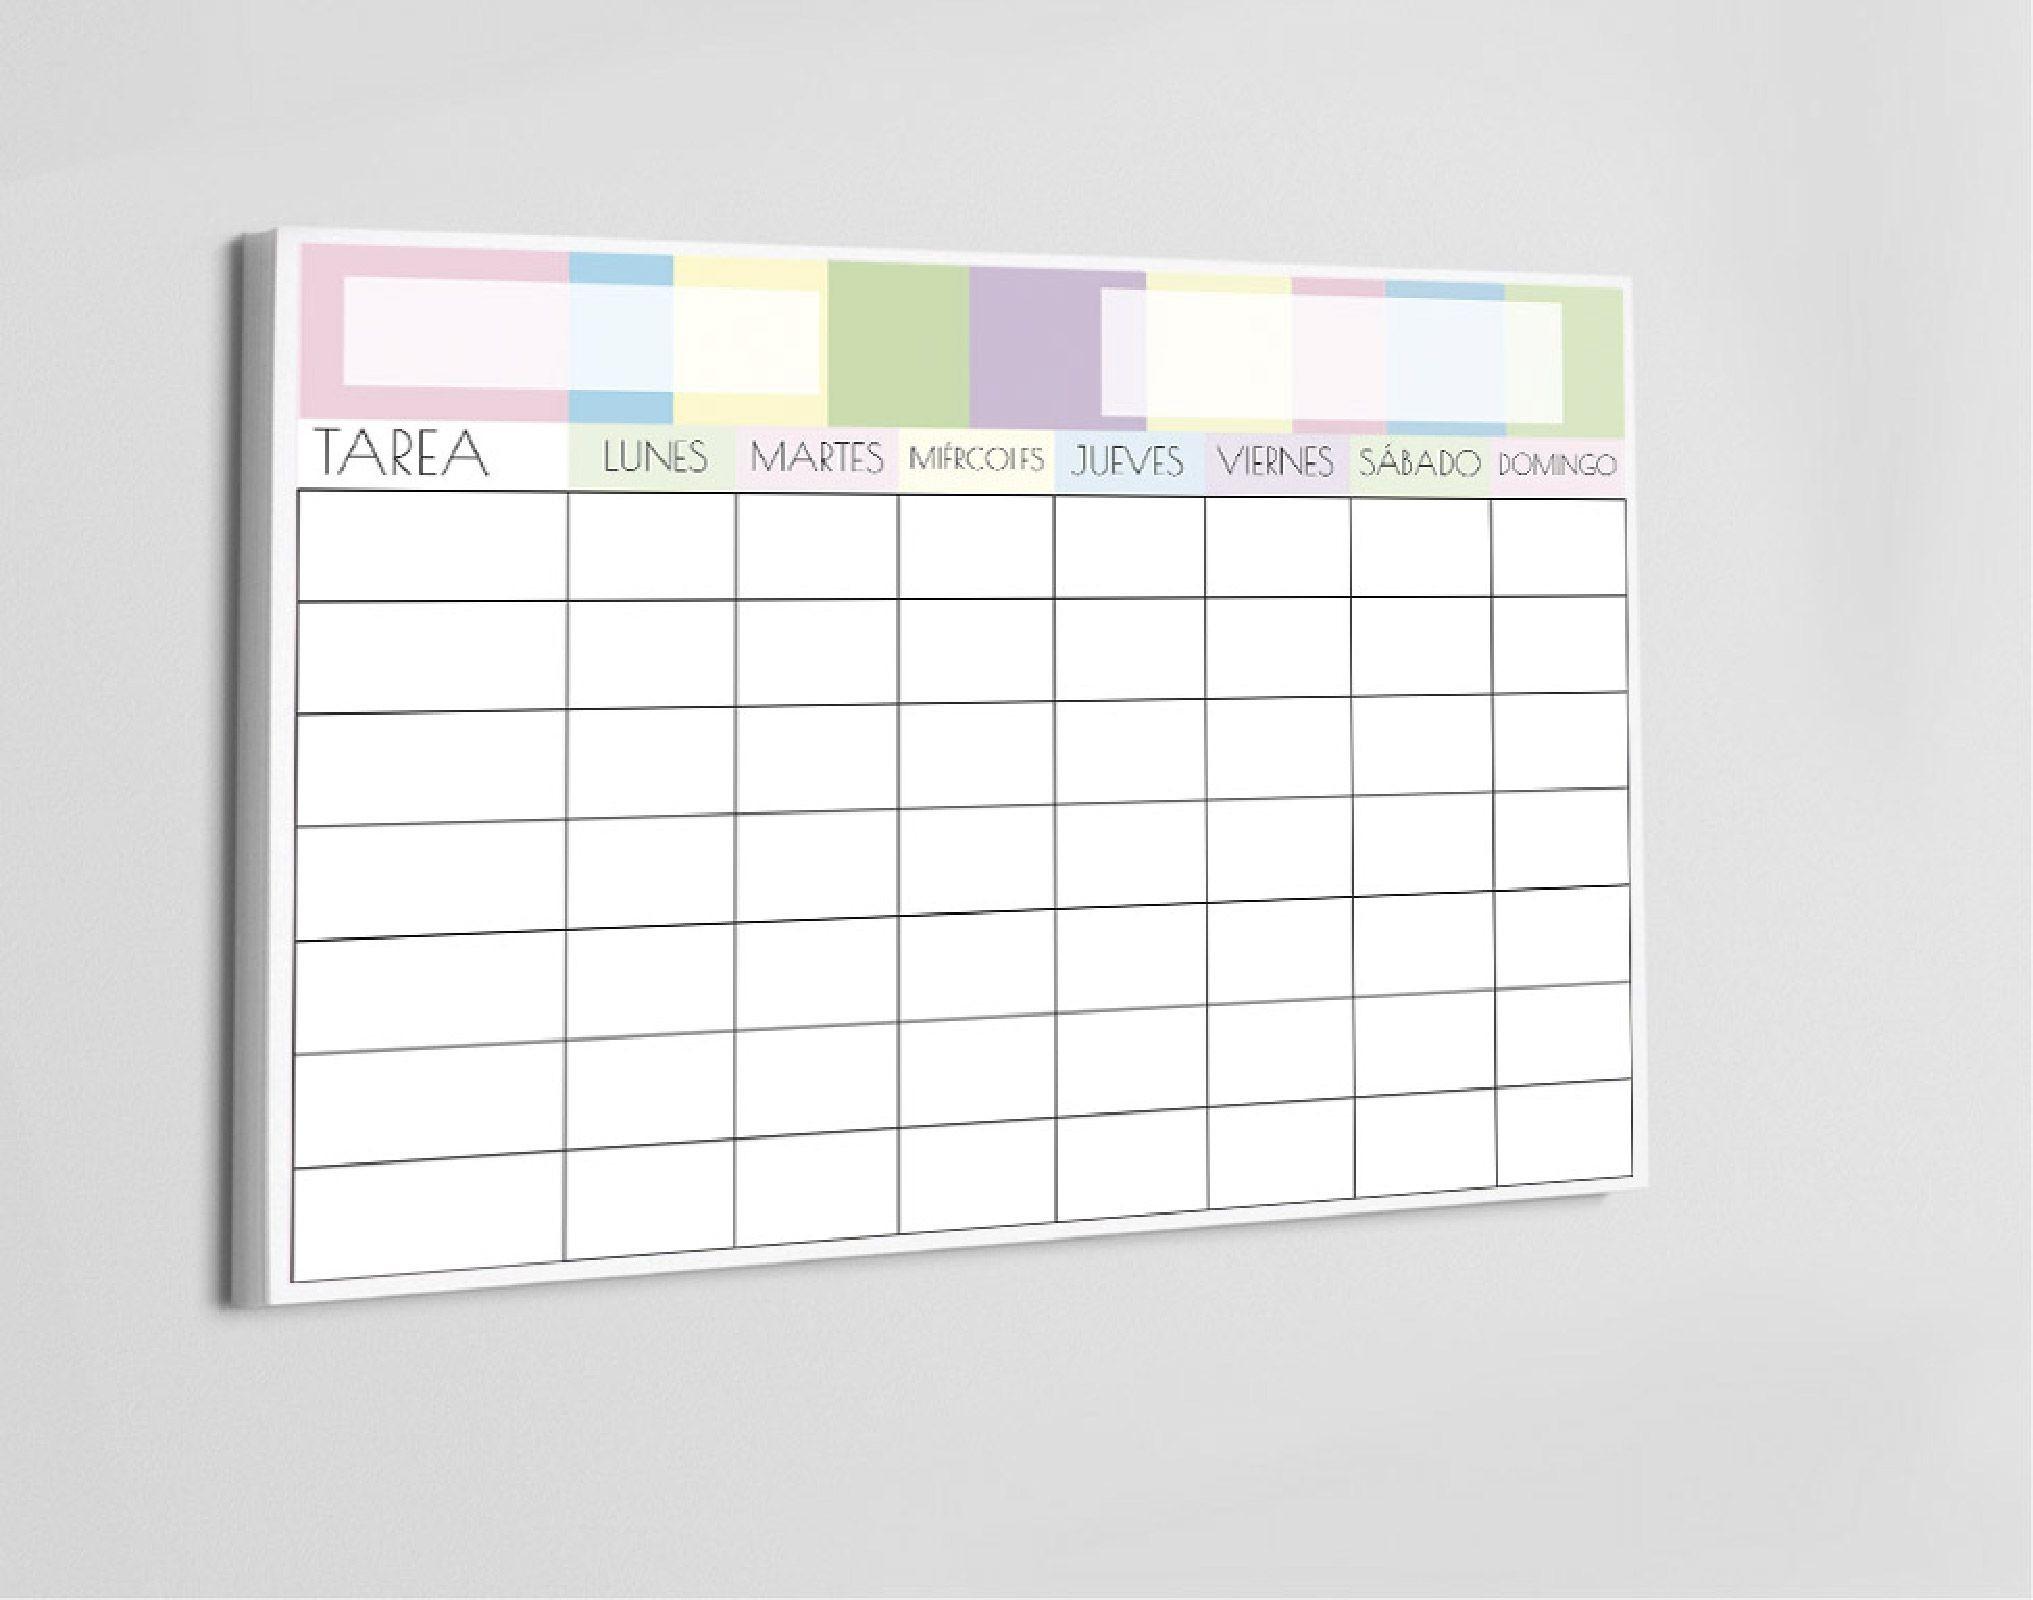 Descarga este planificador de tareas para ni±os Aprenderán a organizarse solitos los deberes agenda planning organizaci³n ni±os